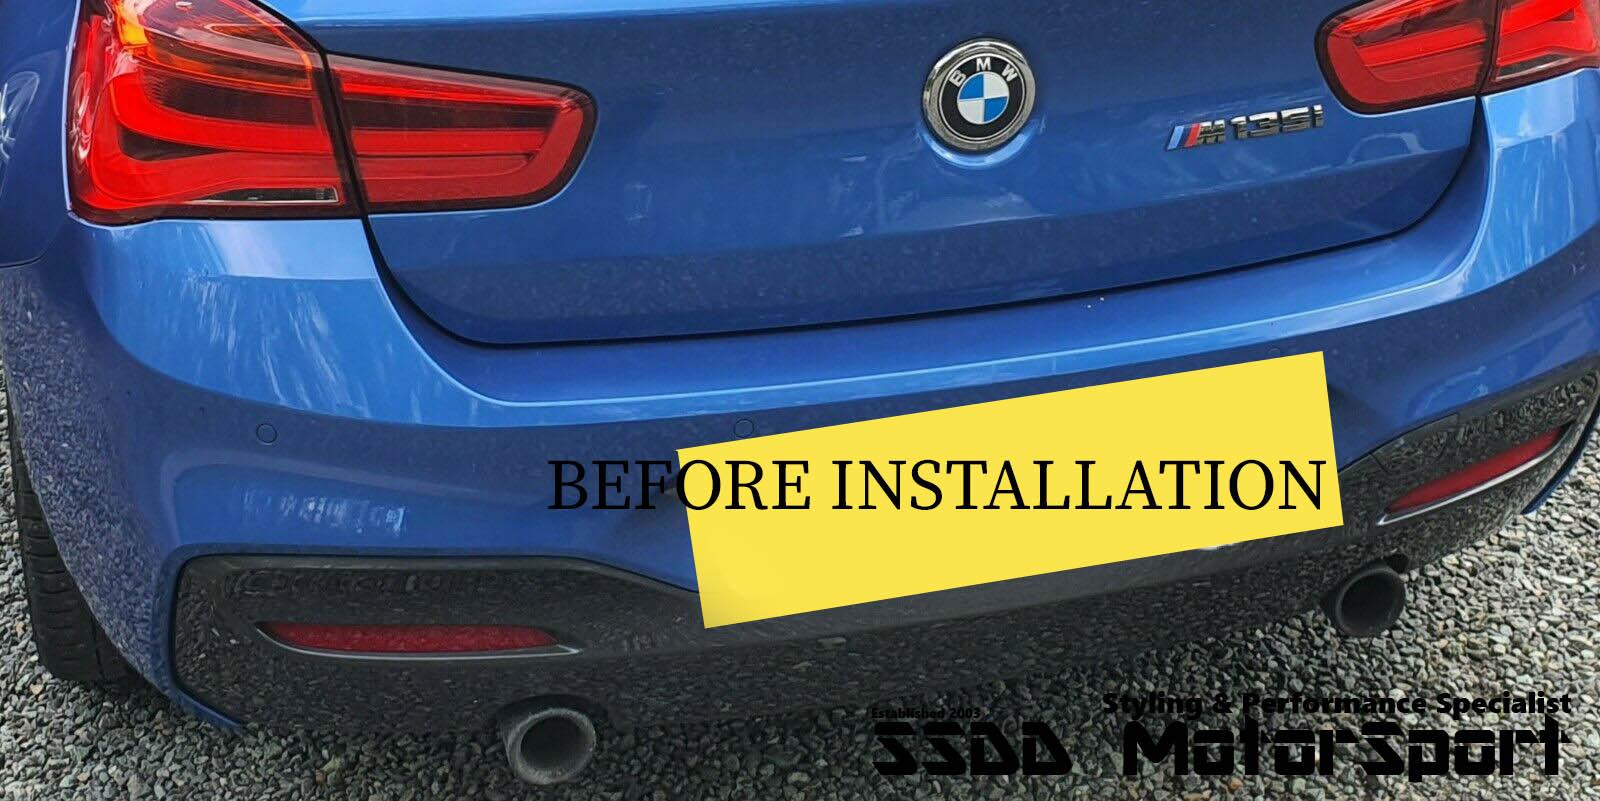 bmw-n55-b58-blue-titanium-slip-on-exhaust-tips-m135i-m140i-m235i-m240i-335i-340i-435i-440i-installed-2.jpg